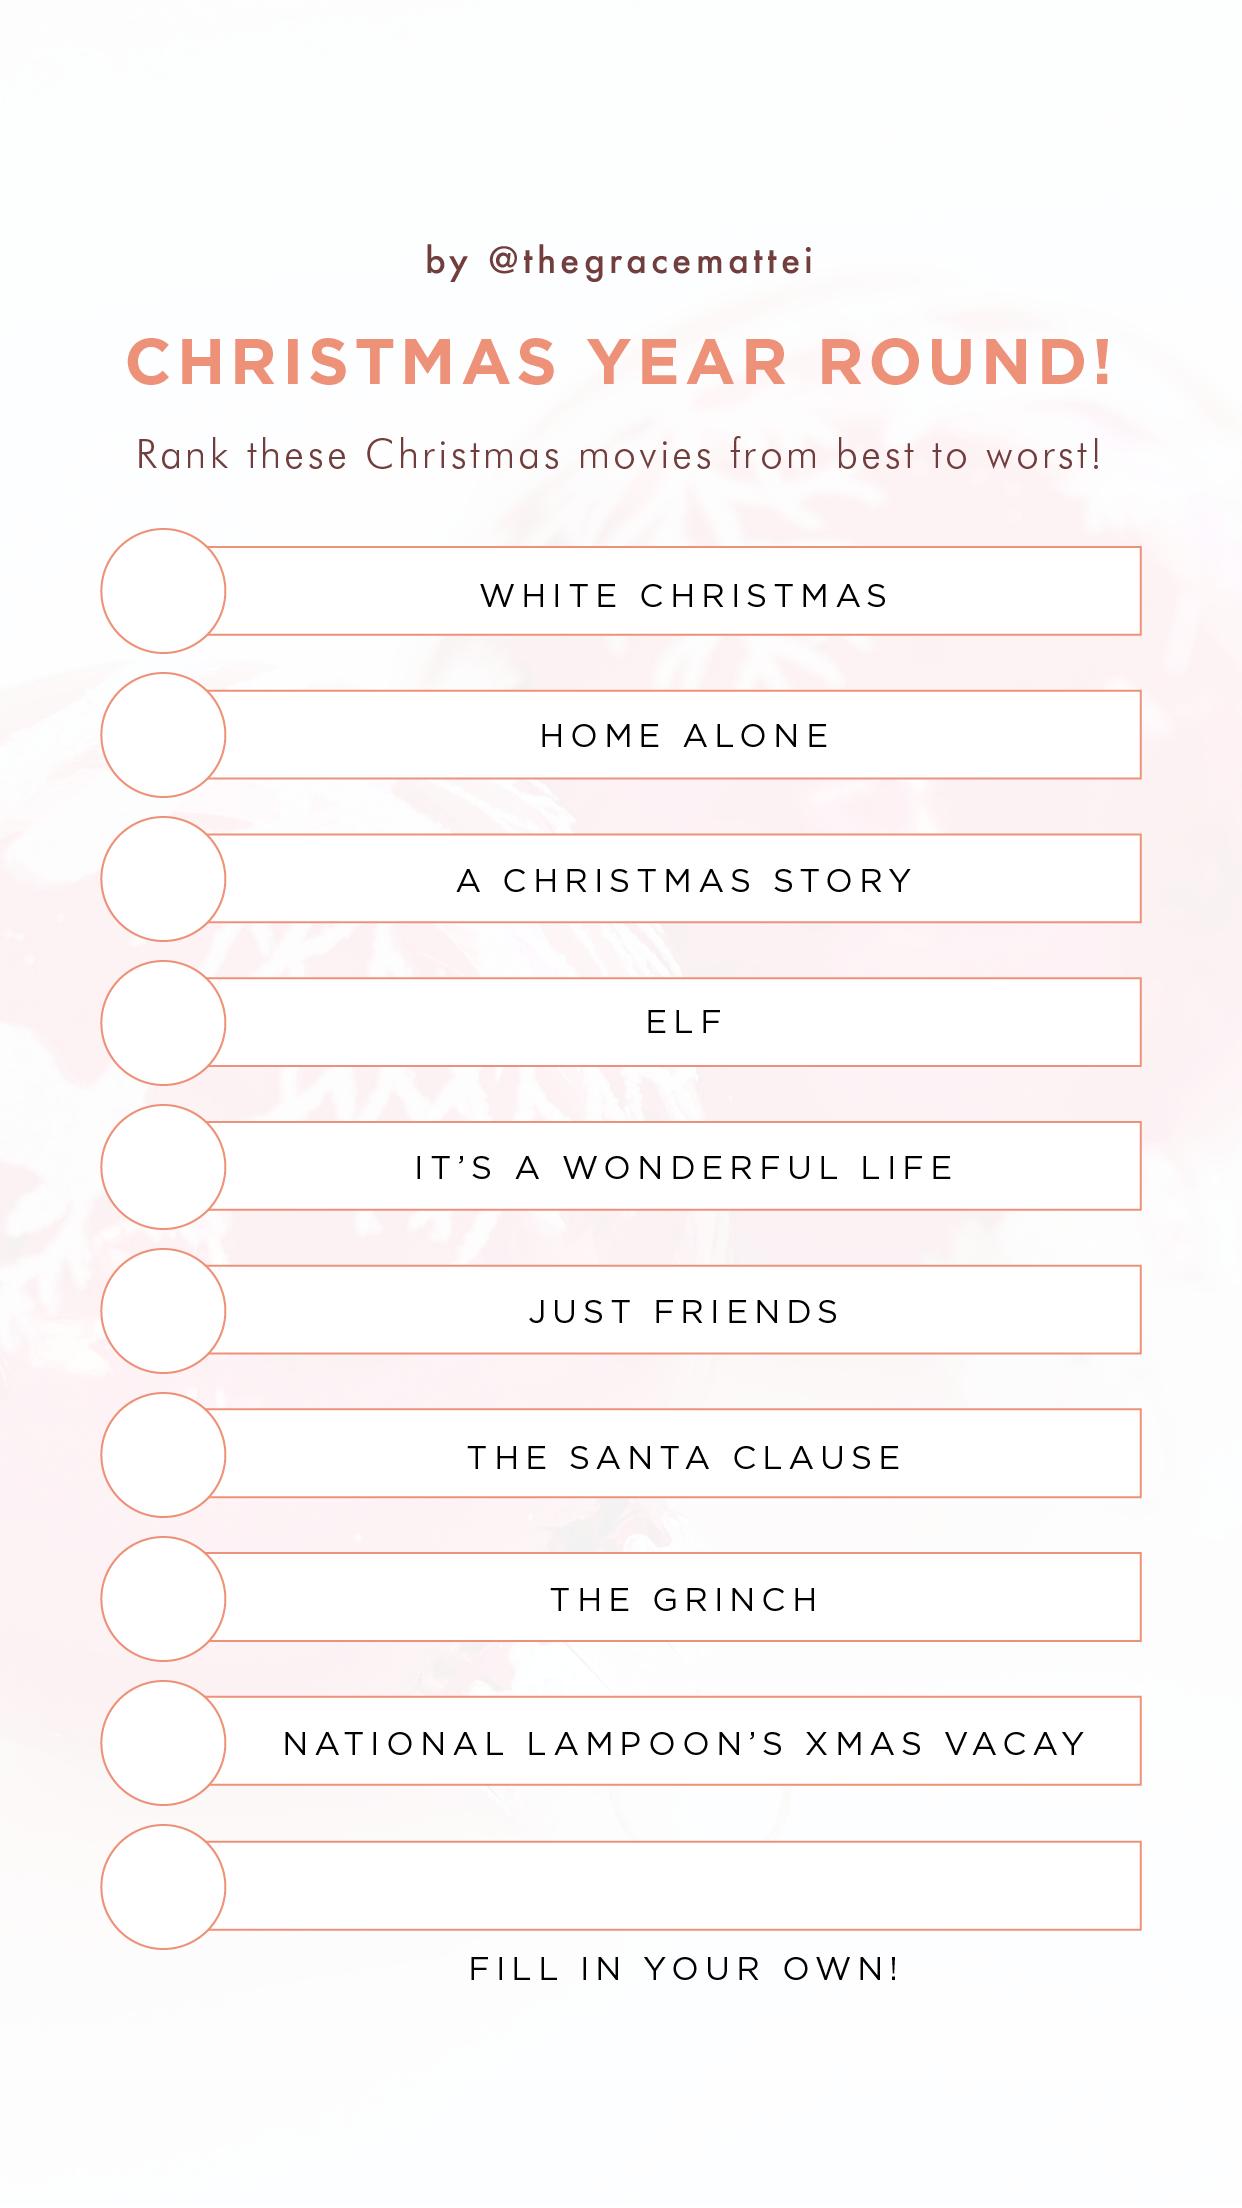 10 Instagram Marketing Tips for Restaurants During the Holidays Season